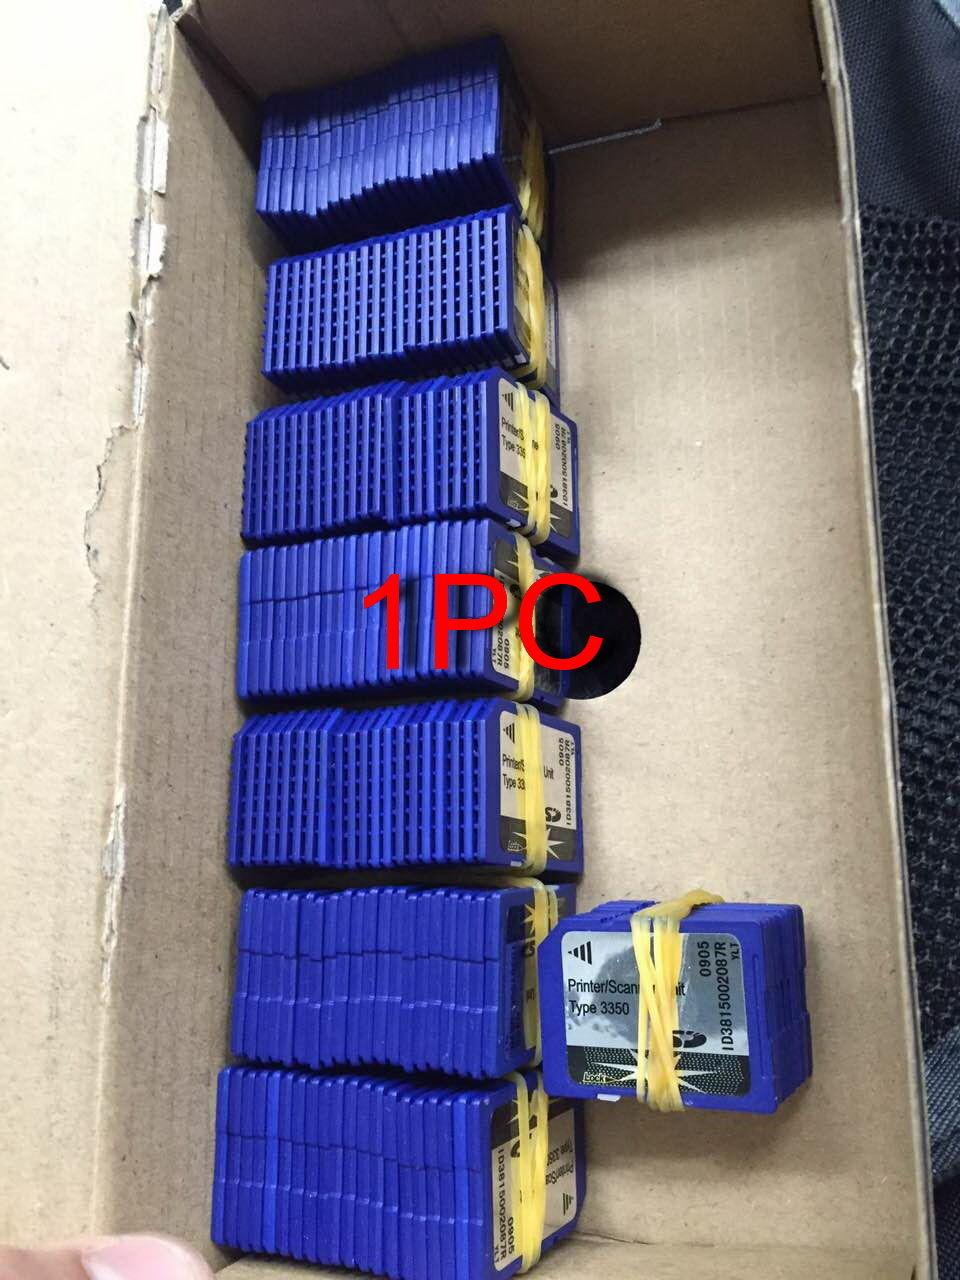 1 tarjeta SD para PC para impresora RICOH MP7001/escáner de tarjeta sd